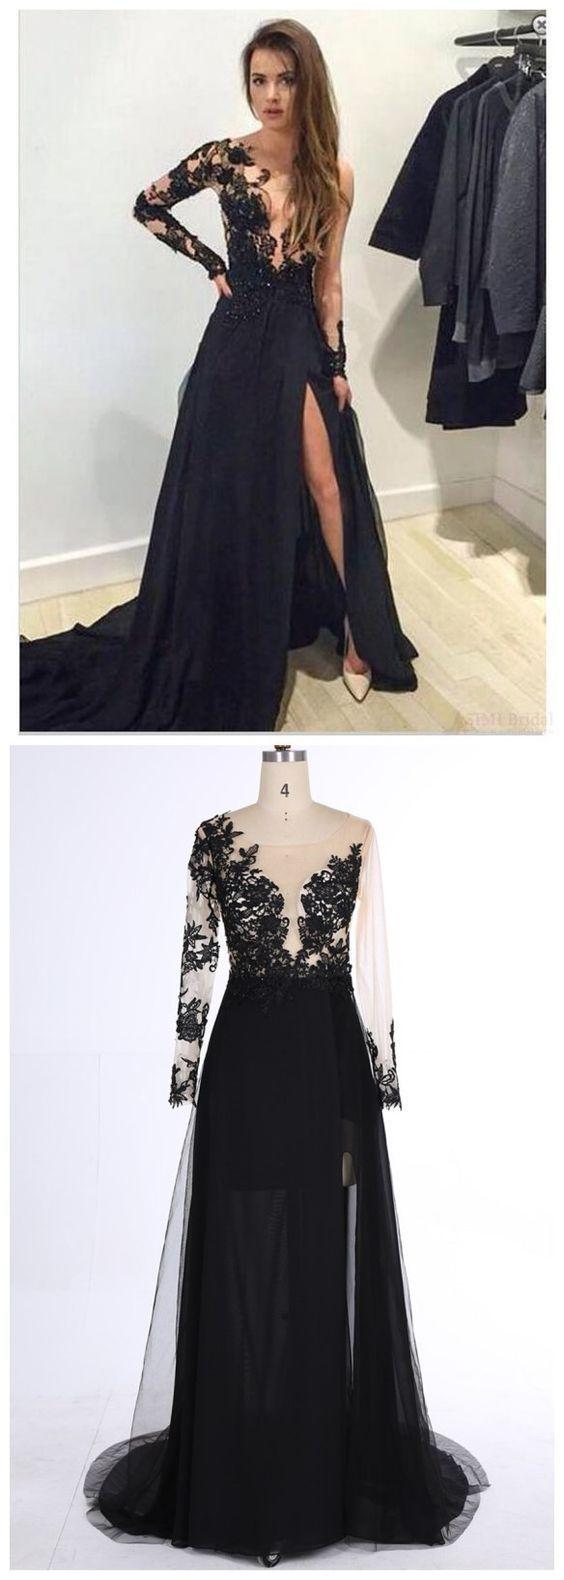 Long Sleeveless Lace Prom Dresses,Mermaid Prom Dresses,Black V-Neck Prom…: